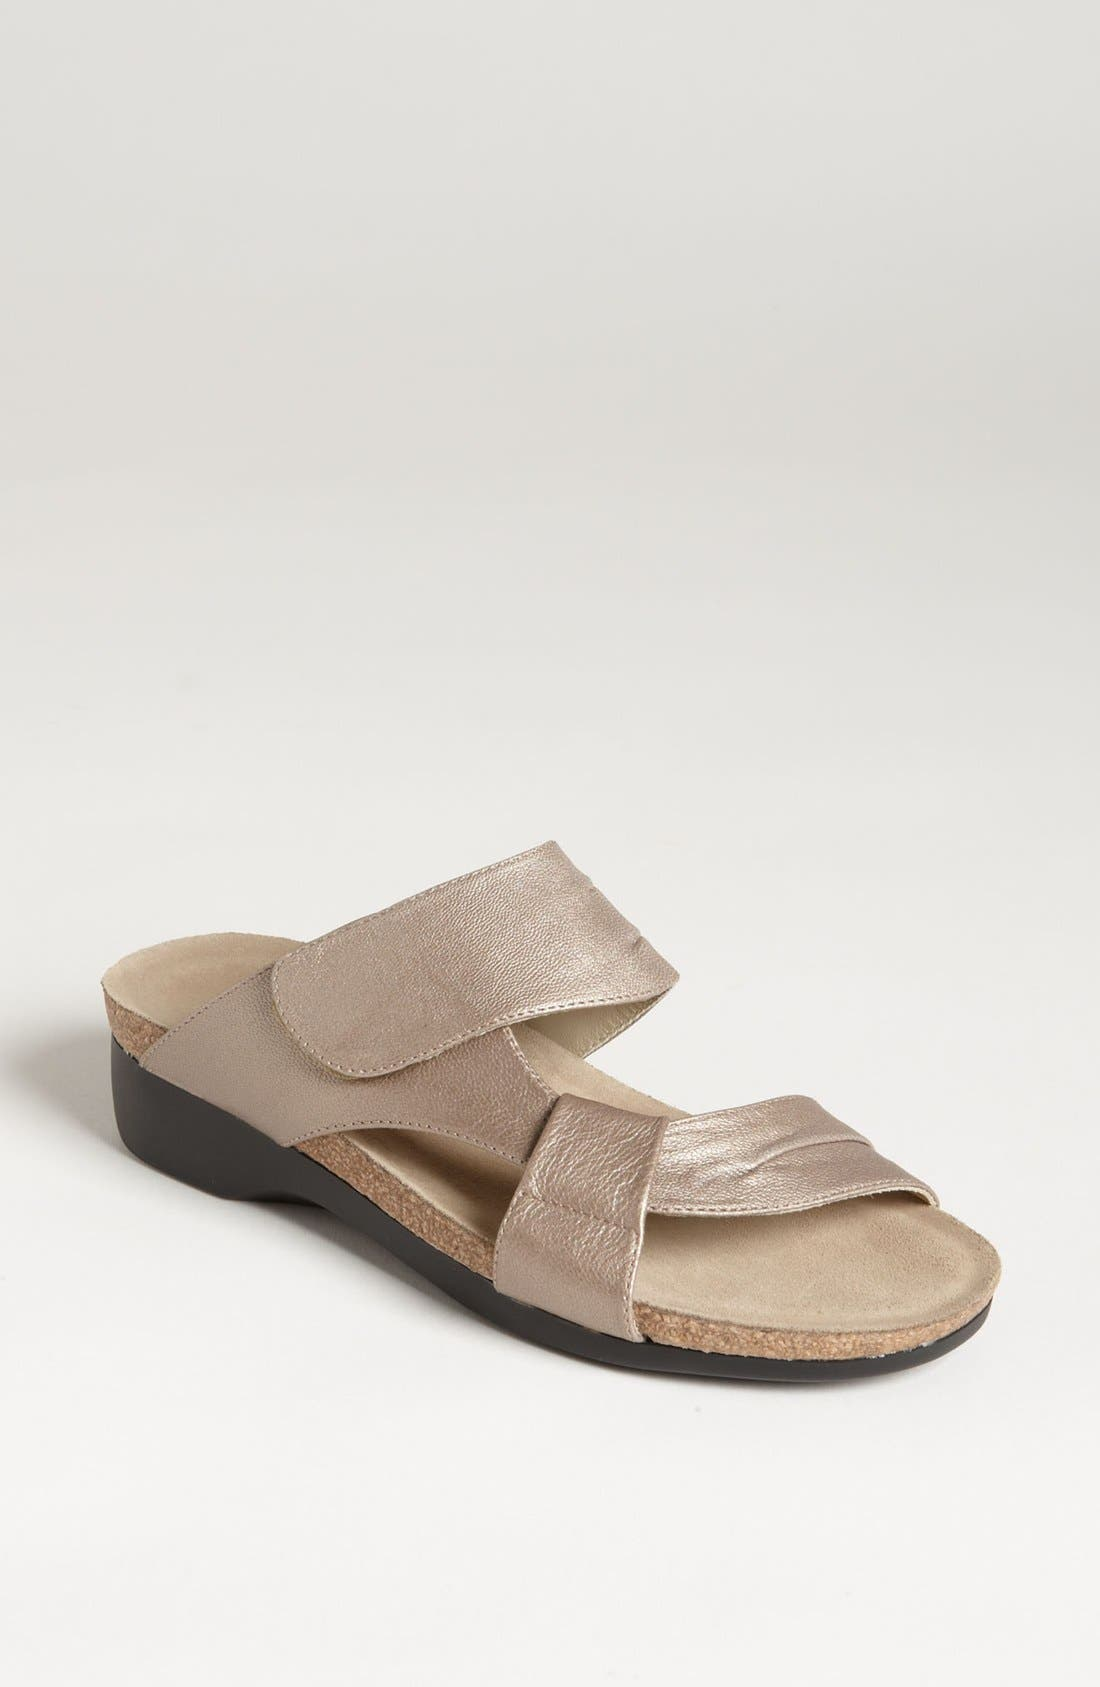 Main Image - Munro 'Libra' Sandal